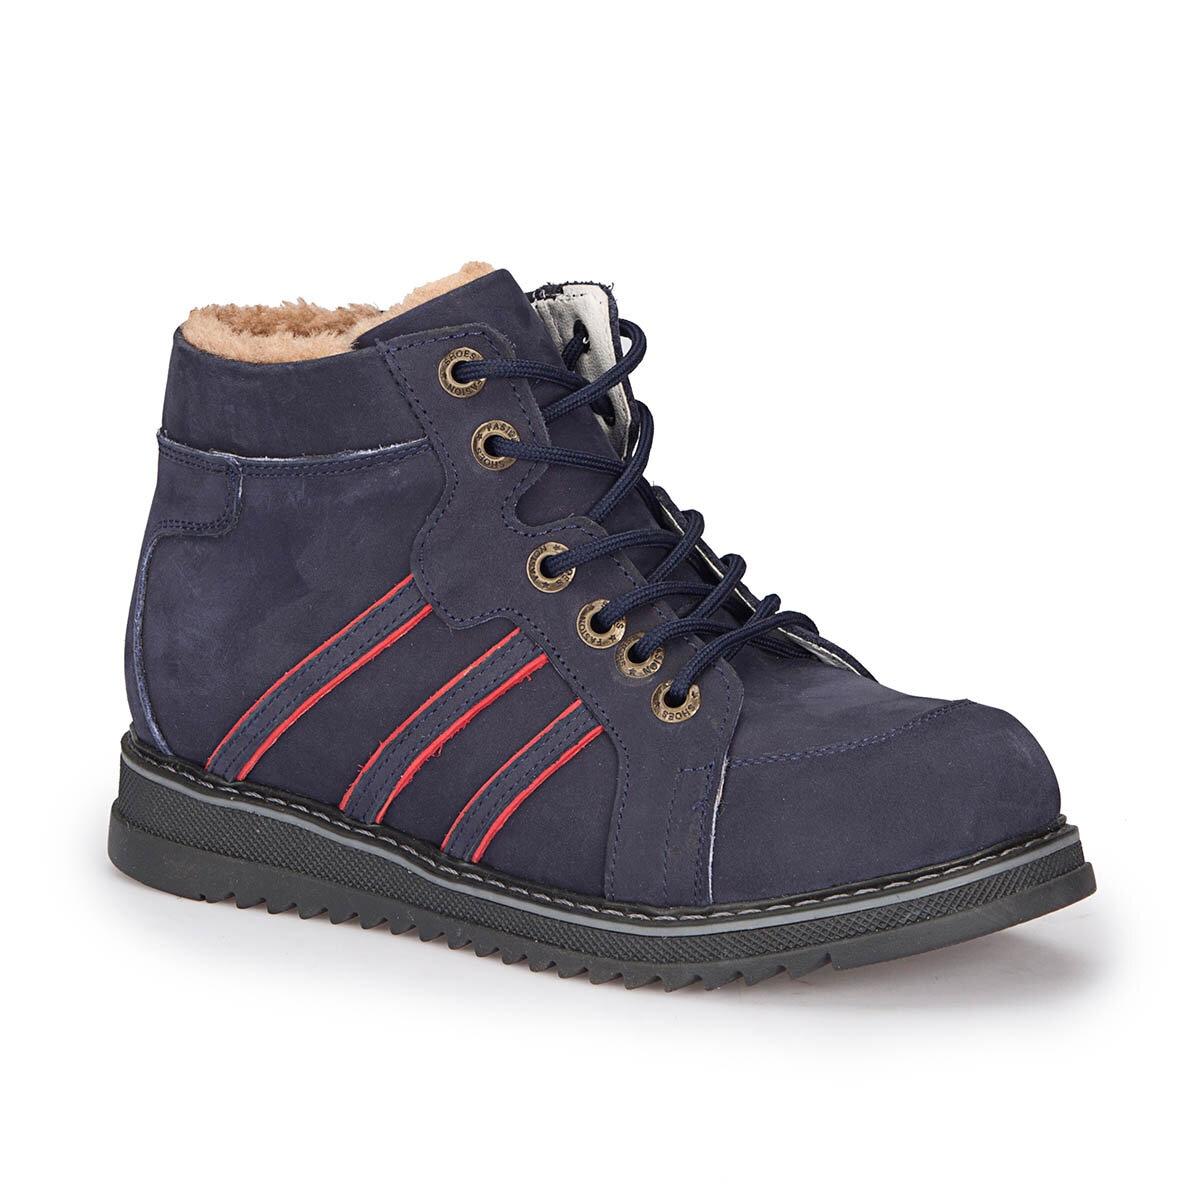 FLO 72.509761.F Navy Blue Male Child Sneaker Shoes Polaris